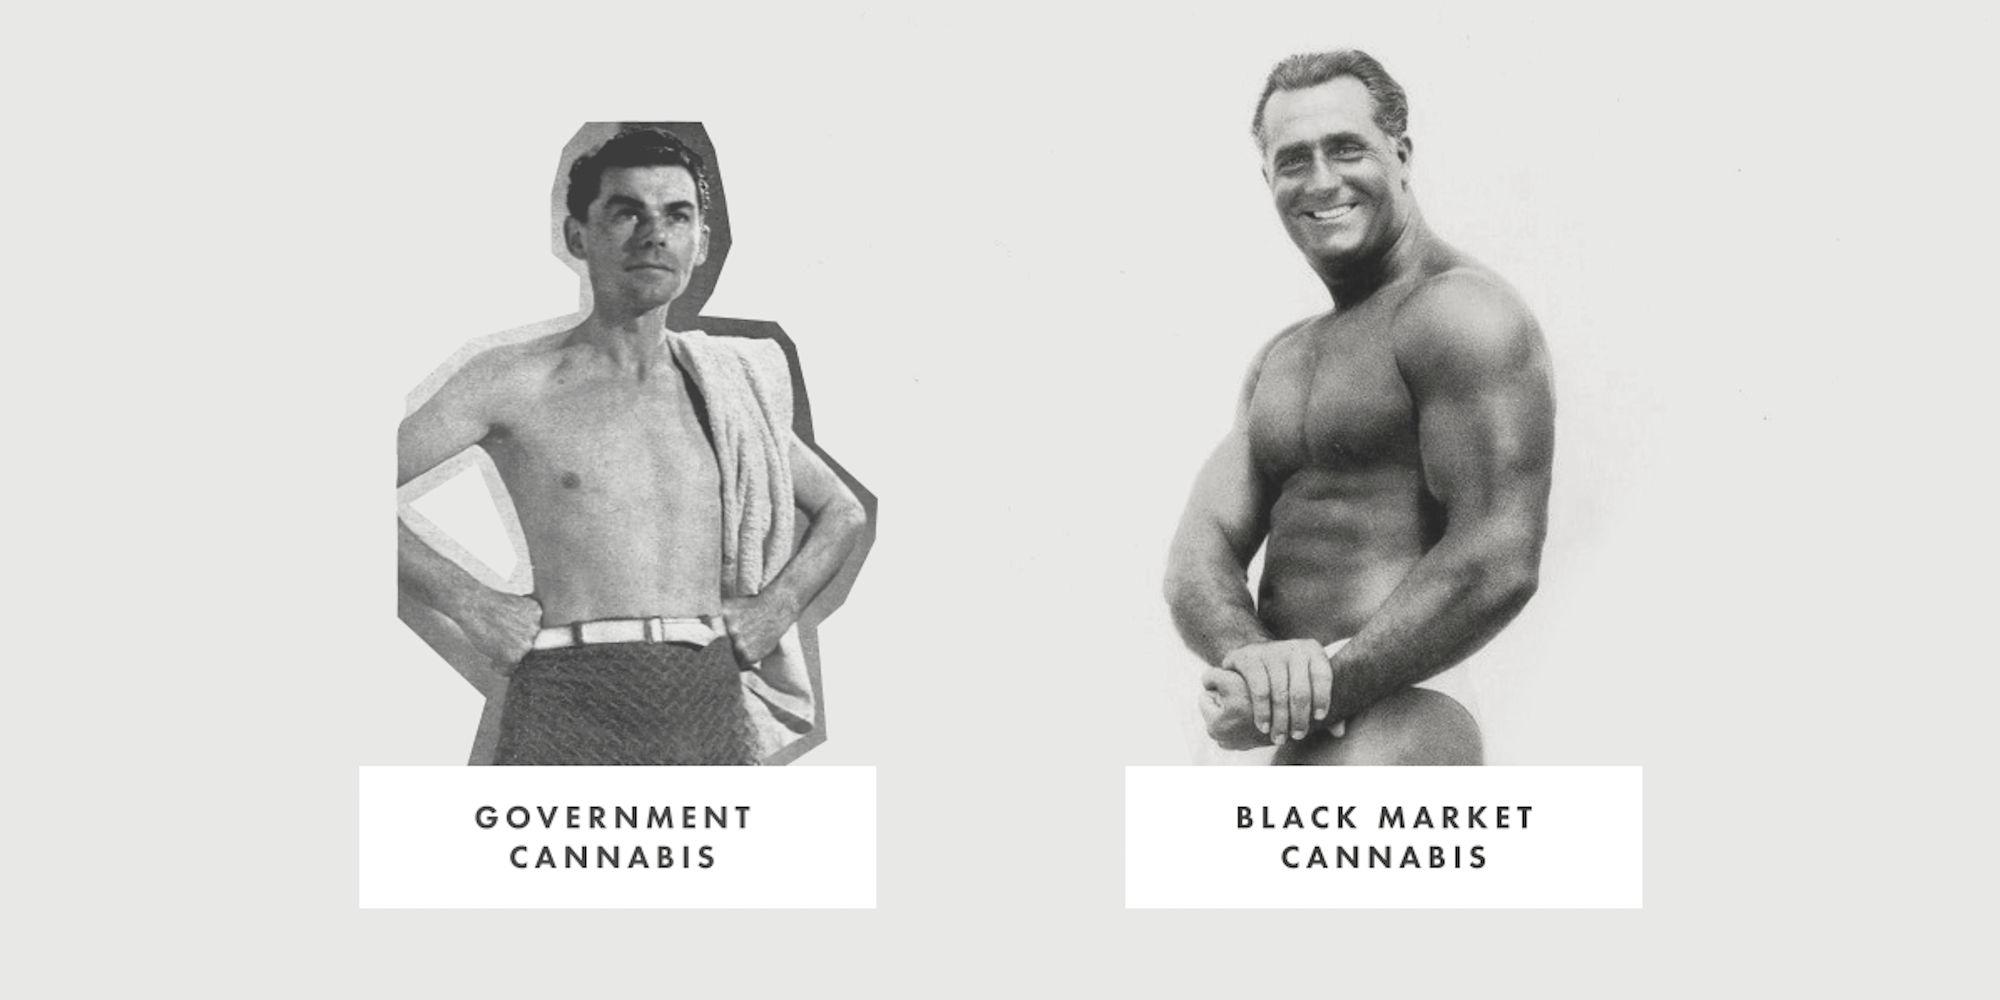 BC's lacklustre cannabis legalization, charted